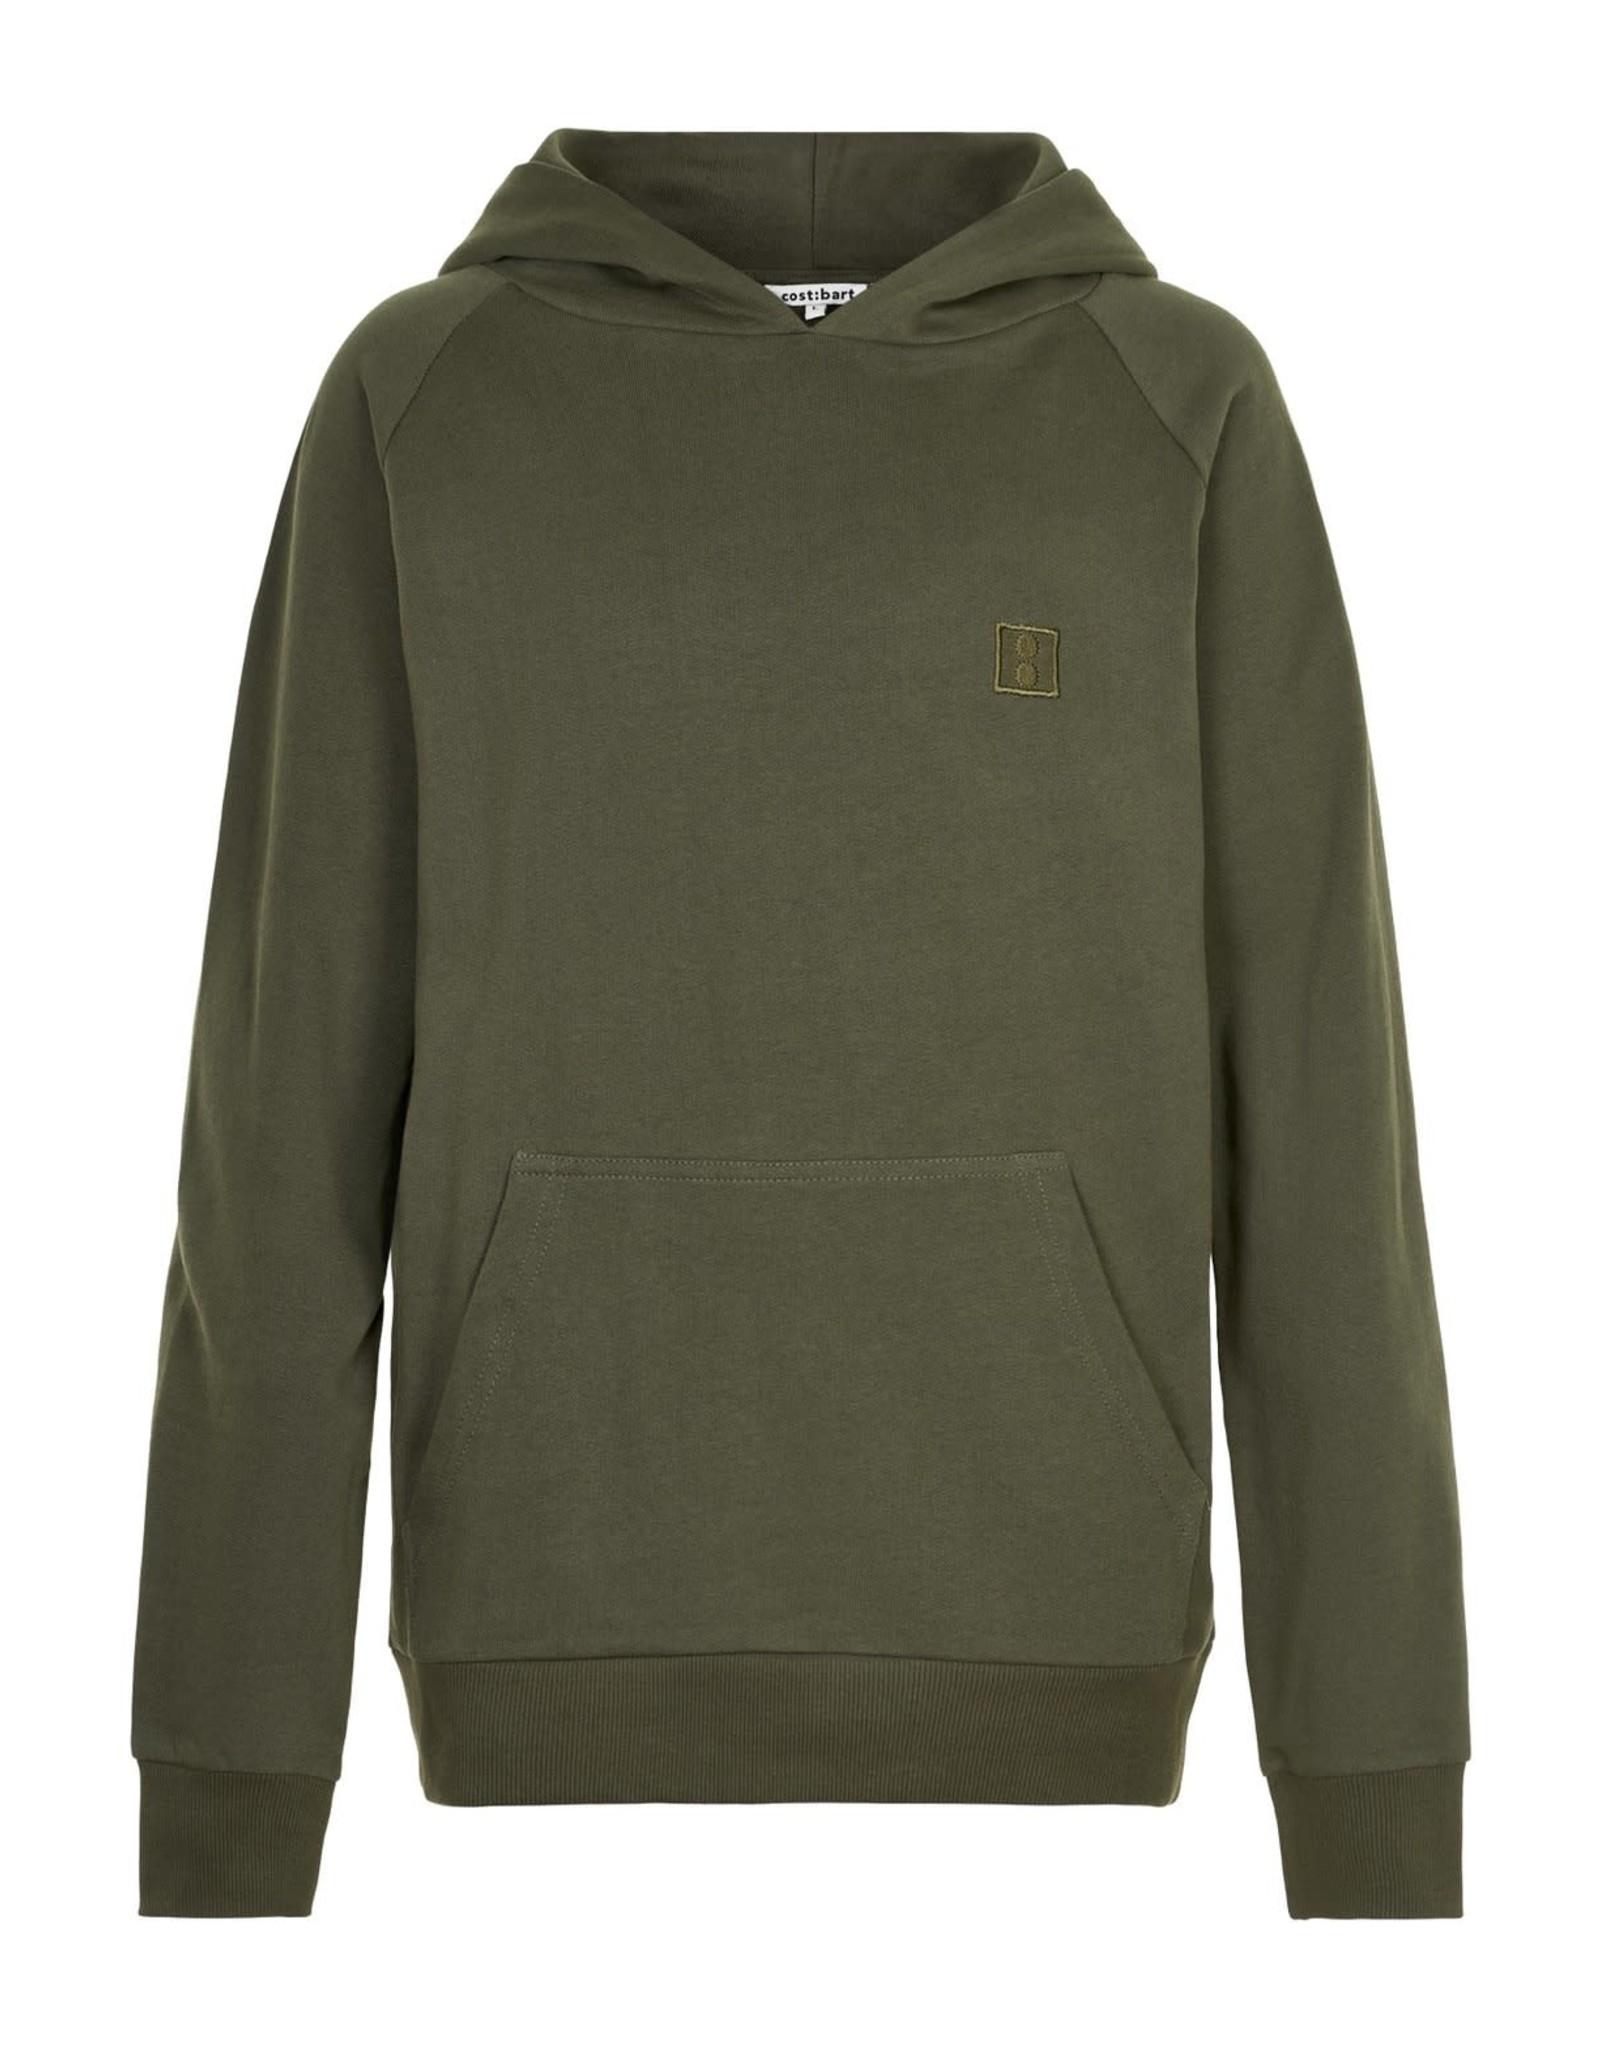 Cost Bart Amsterdam hoodie sweater